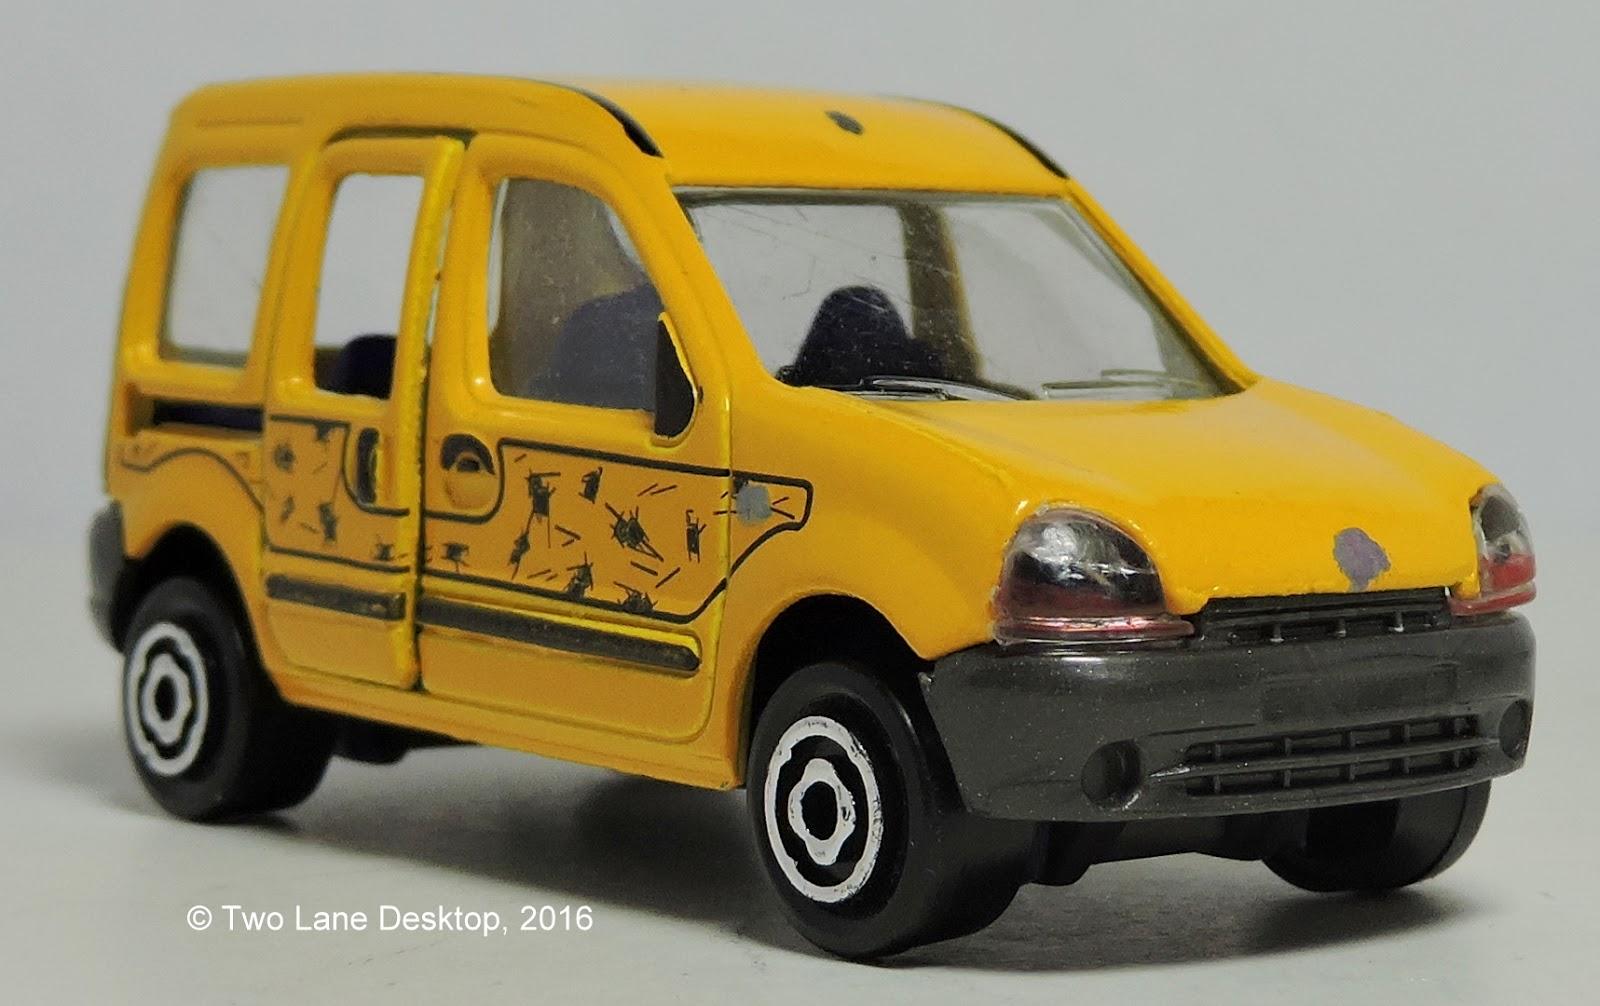 renault vans: majorette renault kangoo, trafic, and matchbox renault